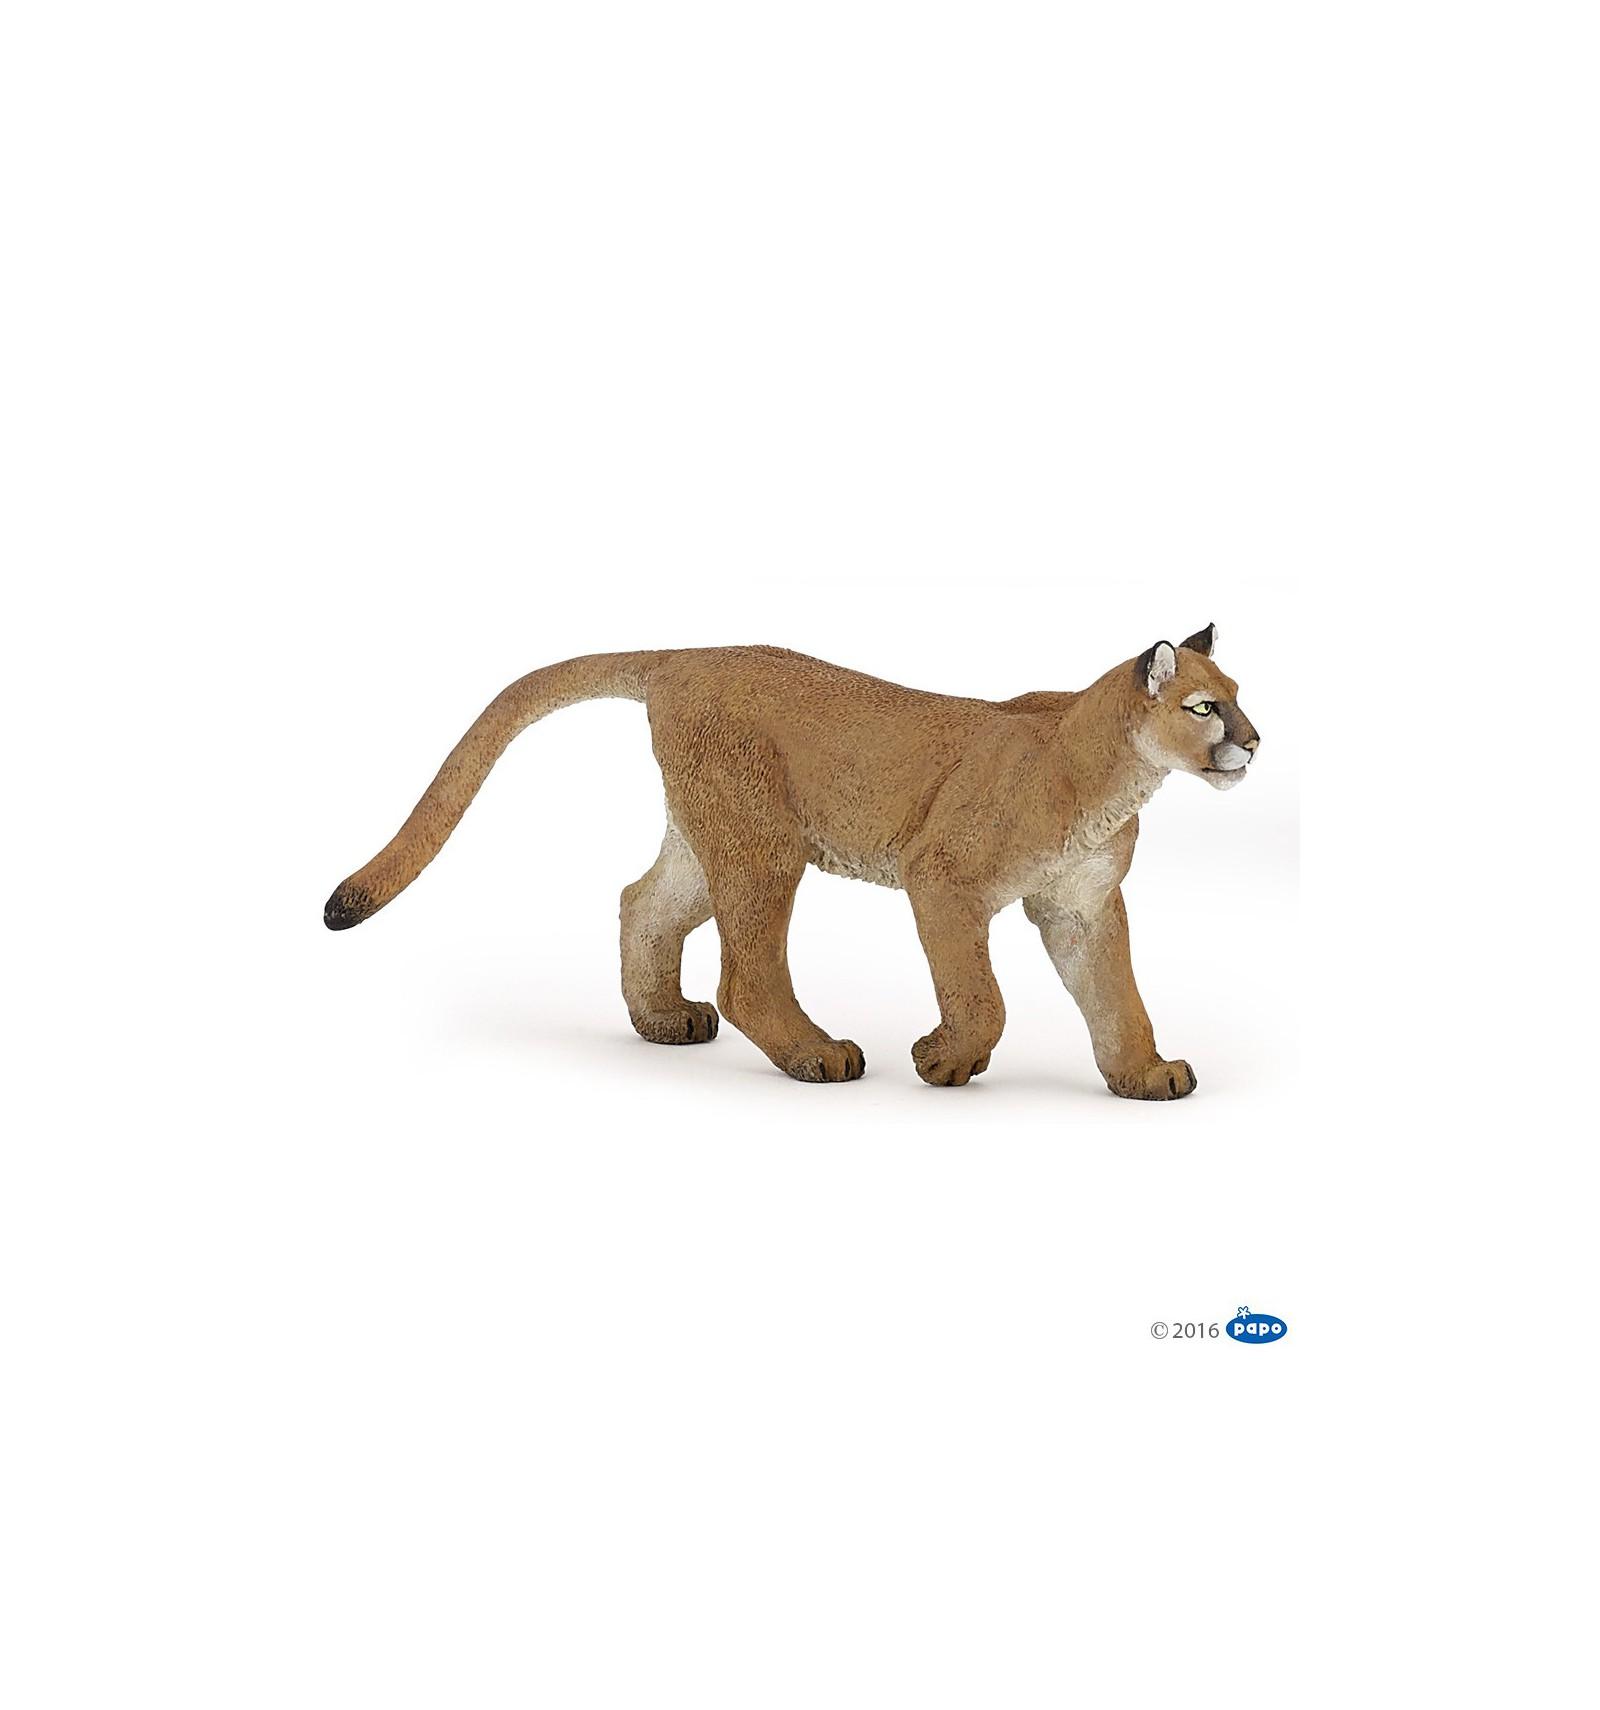 puma animal photo